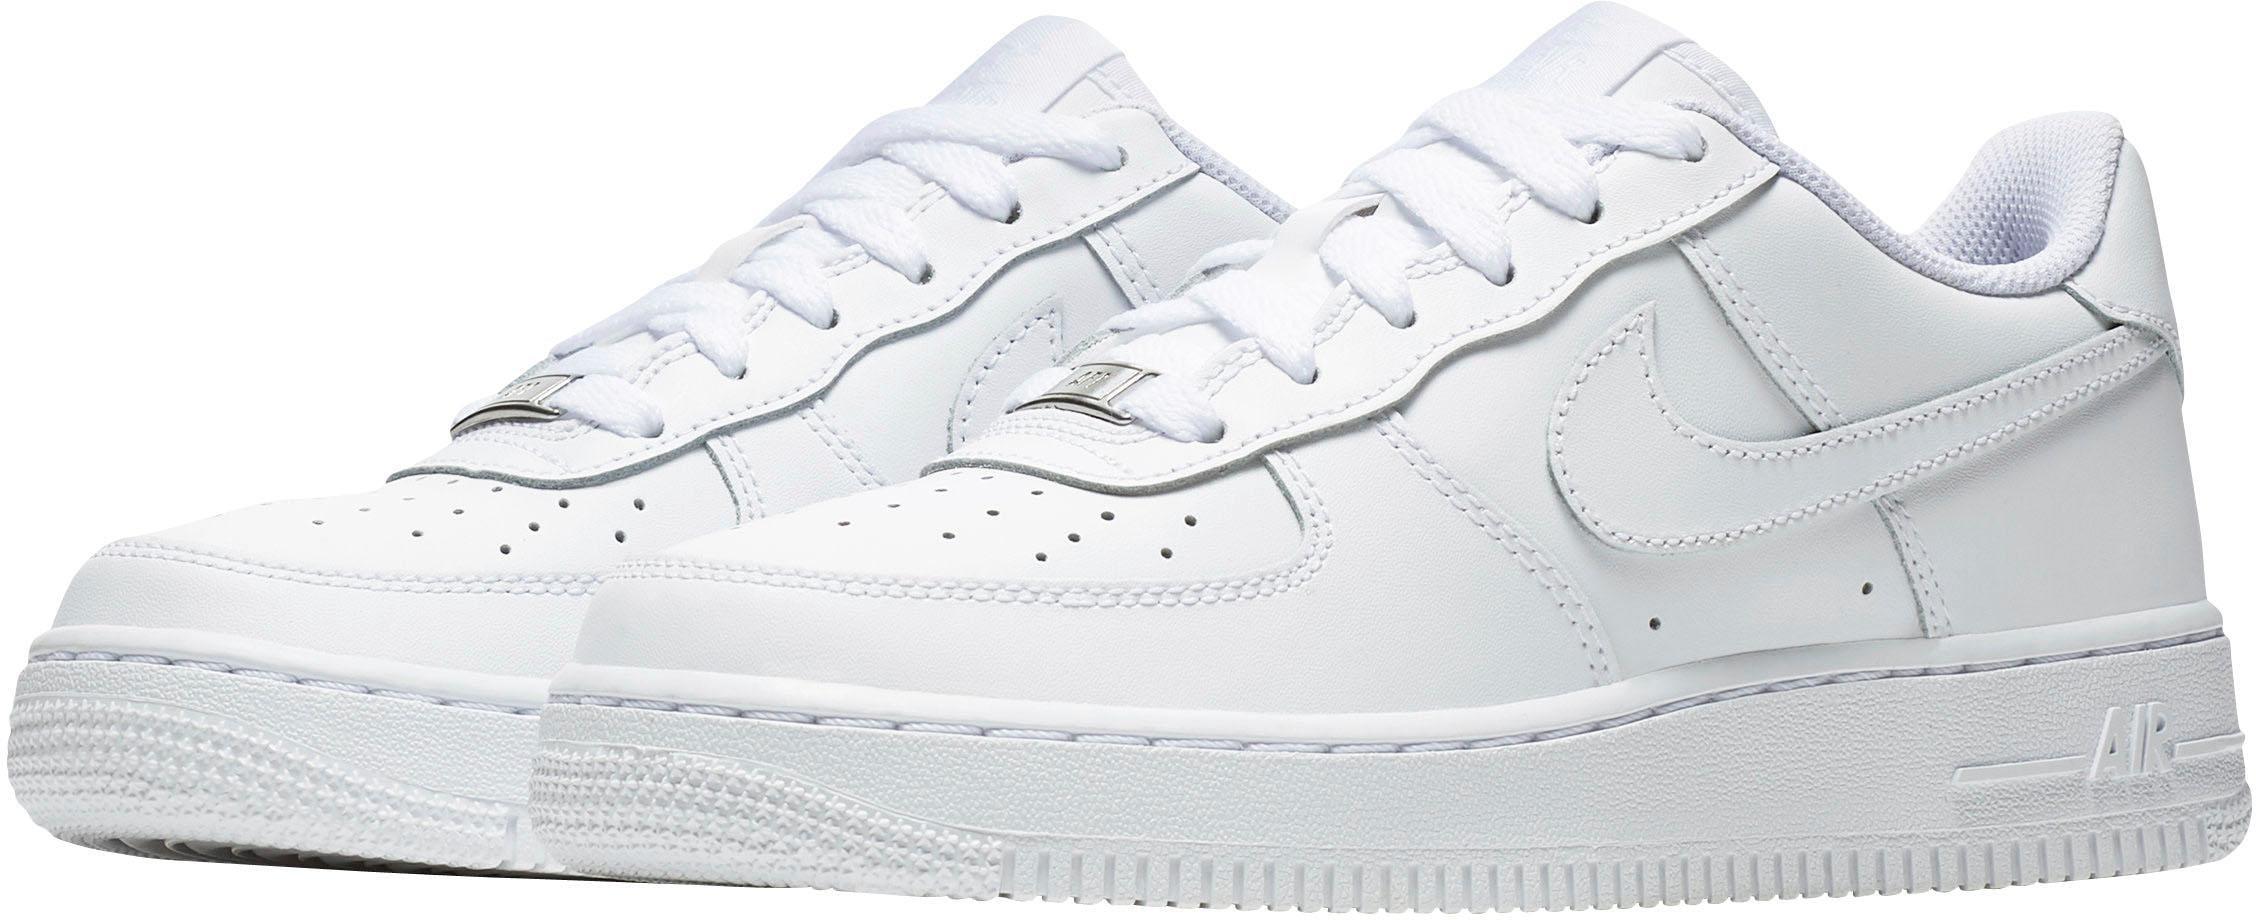 Nike Sportswear Sneaker »AIR FORCE 1 BG« online bestellen   BAUR